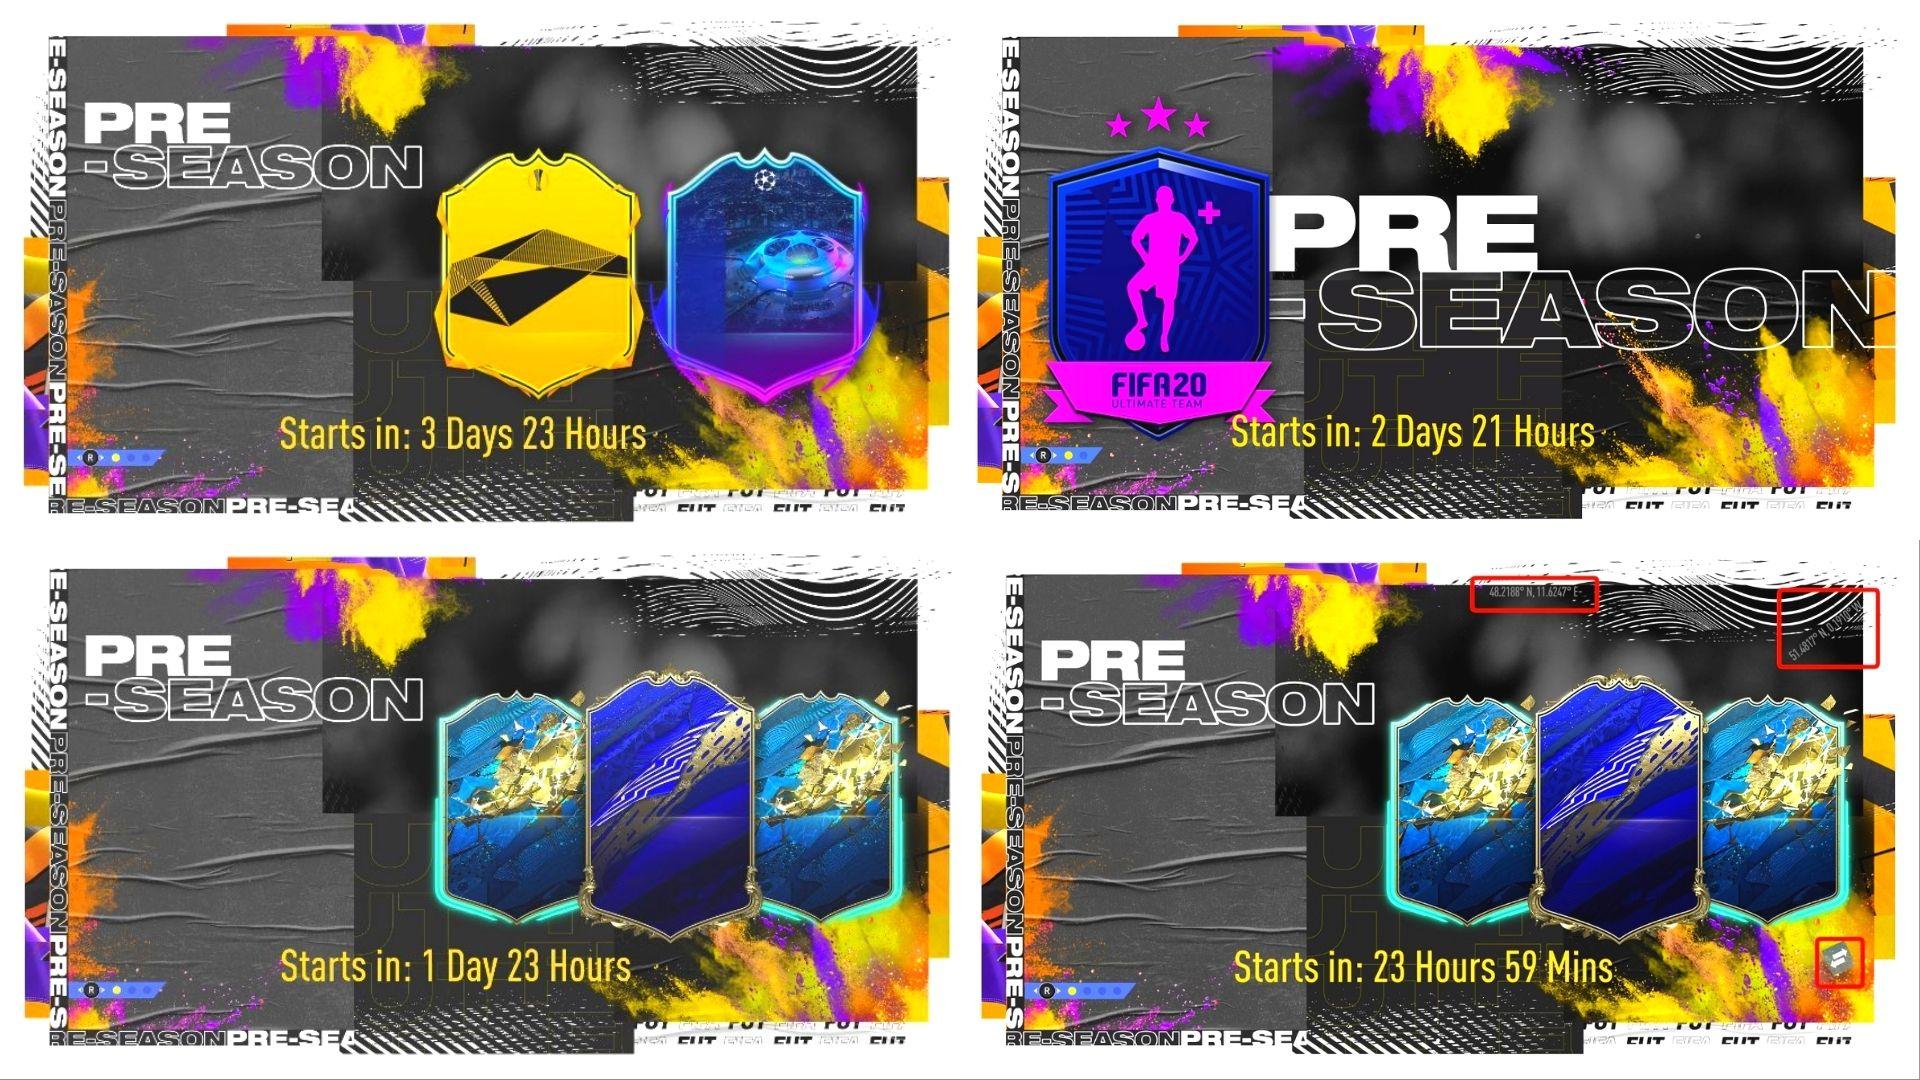 Pre-Season teasers for FIFA 20 Pre- Season